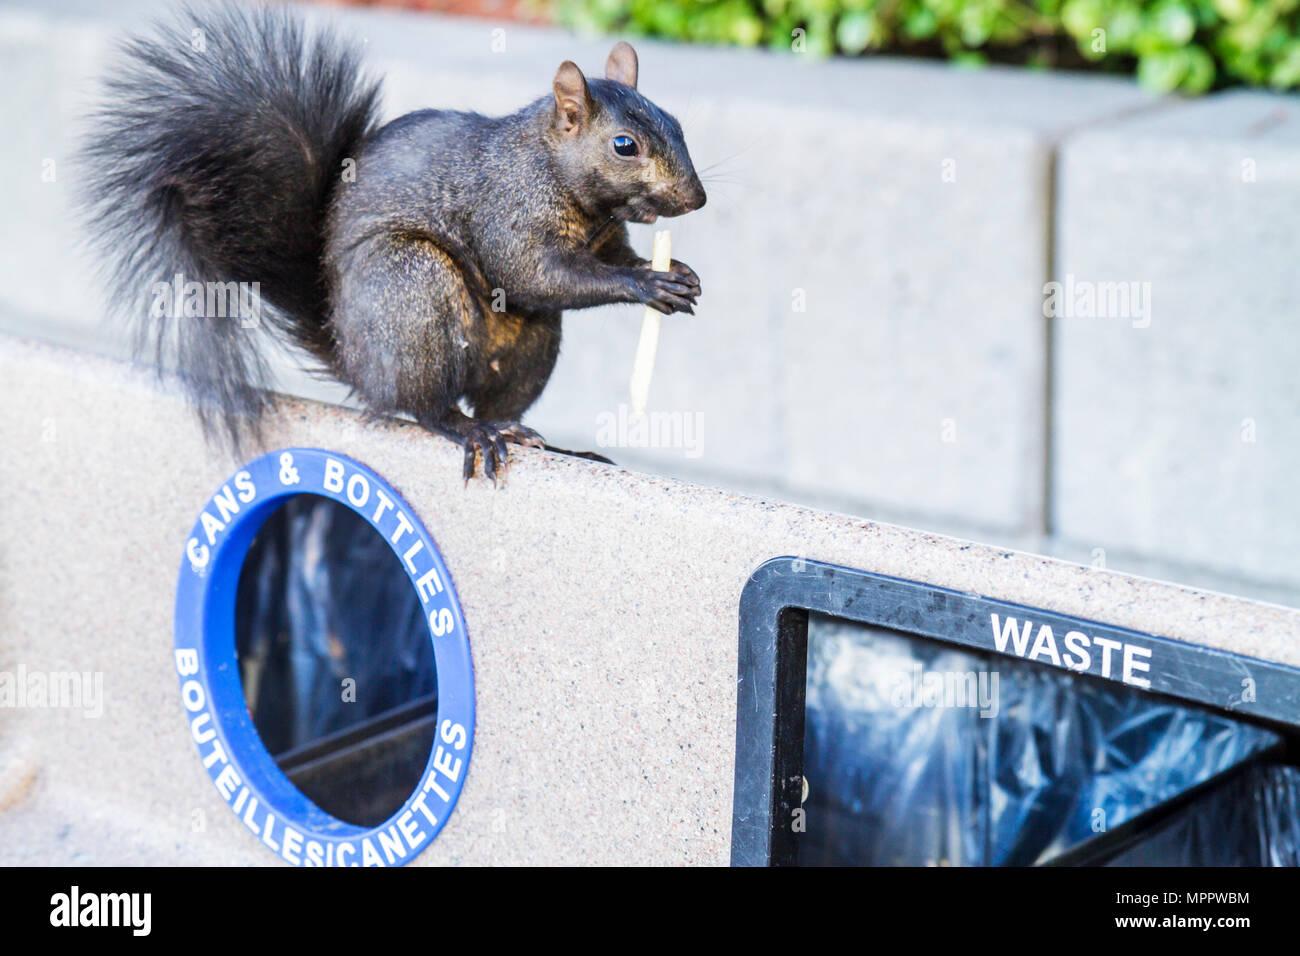 Toronto, Canadá Ontario Bremner Boulevard papelera residuos Ardilla negra Sciuridae roedor animal comiendo papas fritas de supervivencia urbana Imagen De Stock